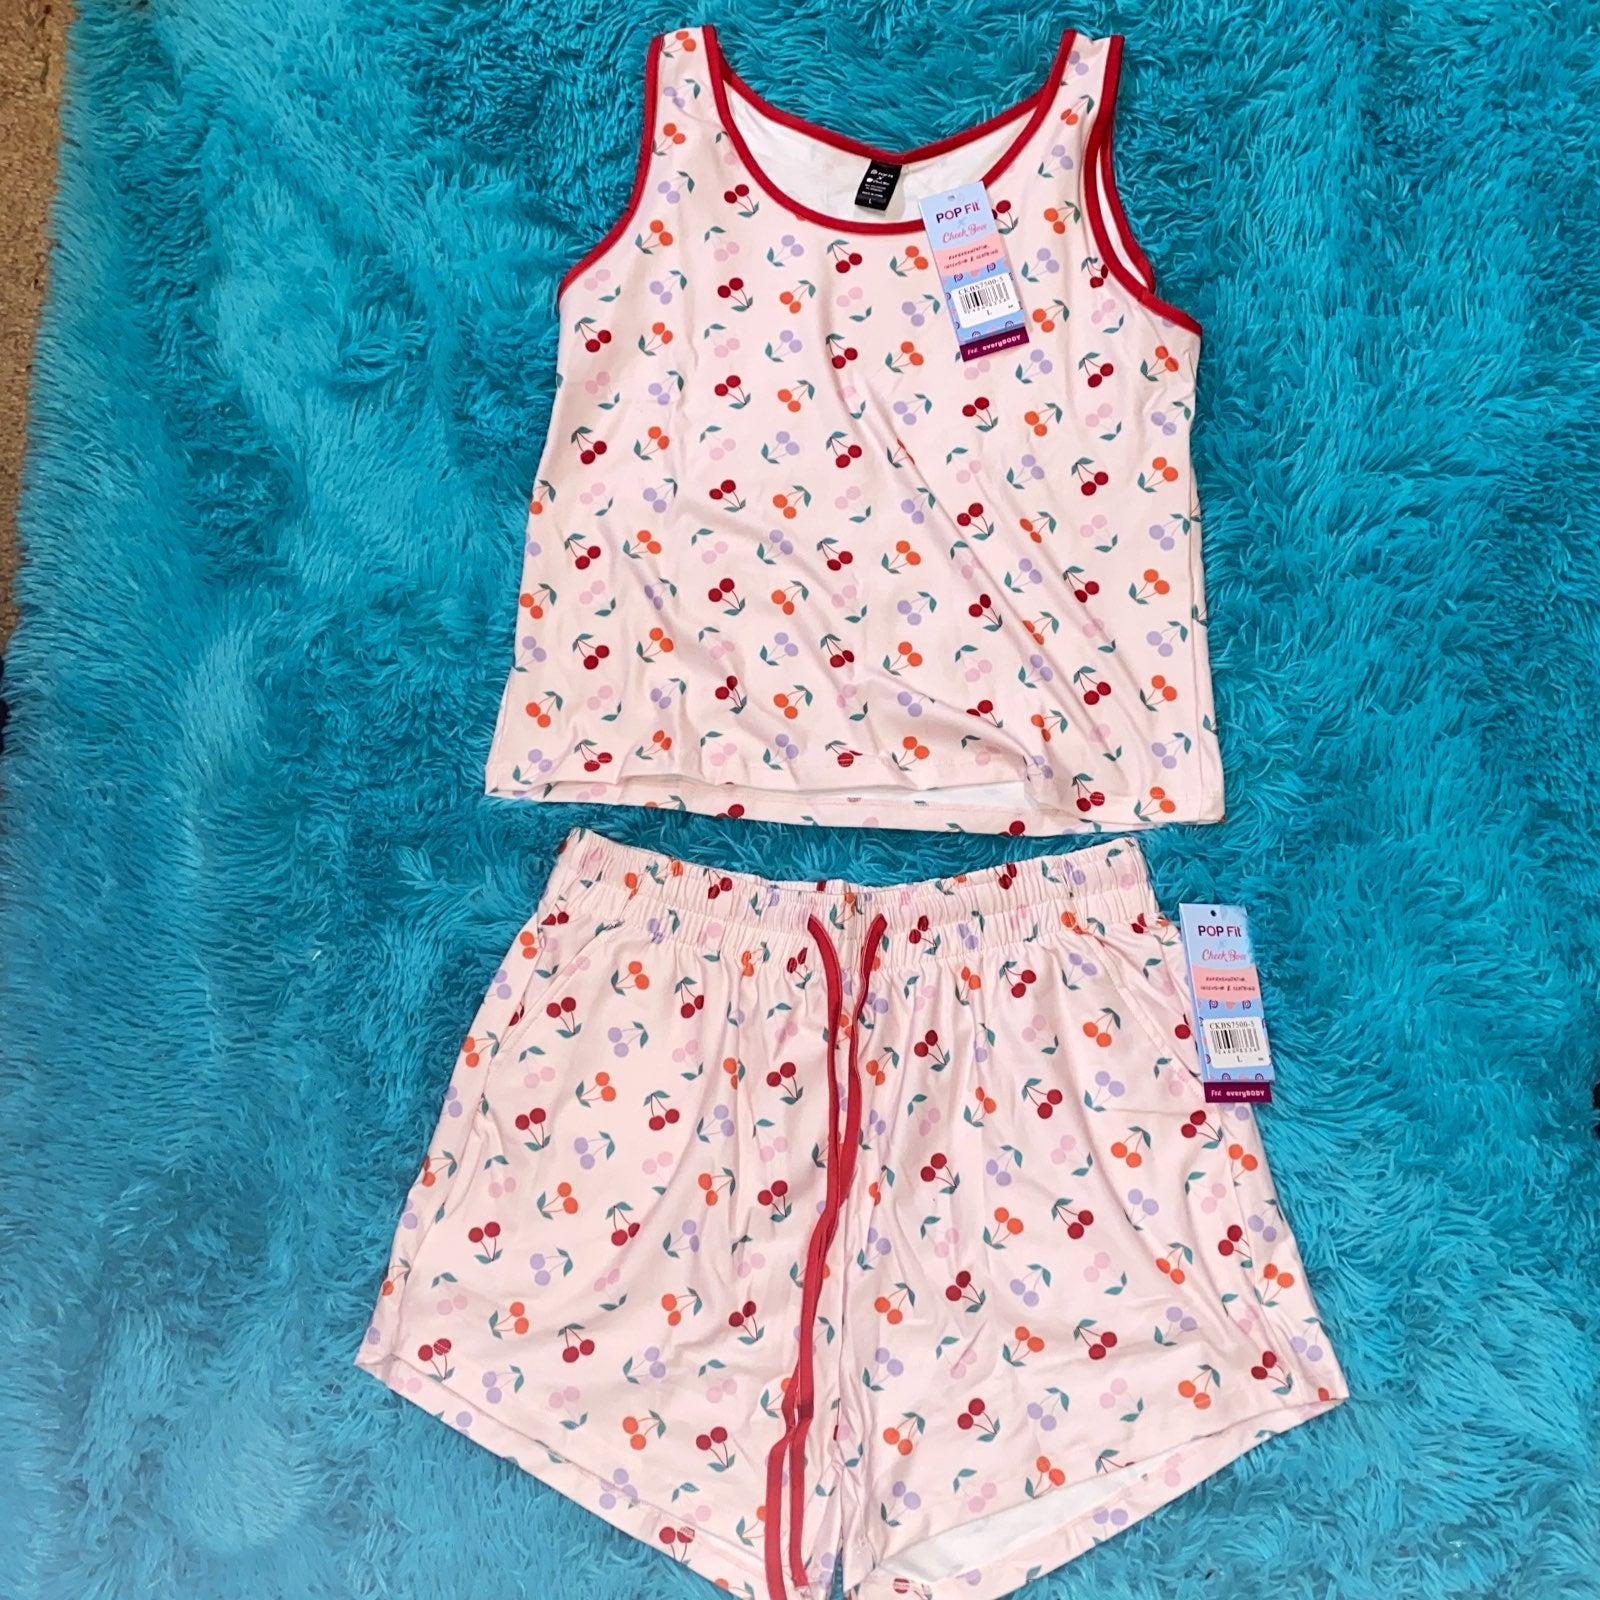 NWT Cheek Boss Loungewear Pajamas Set